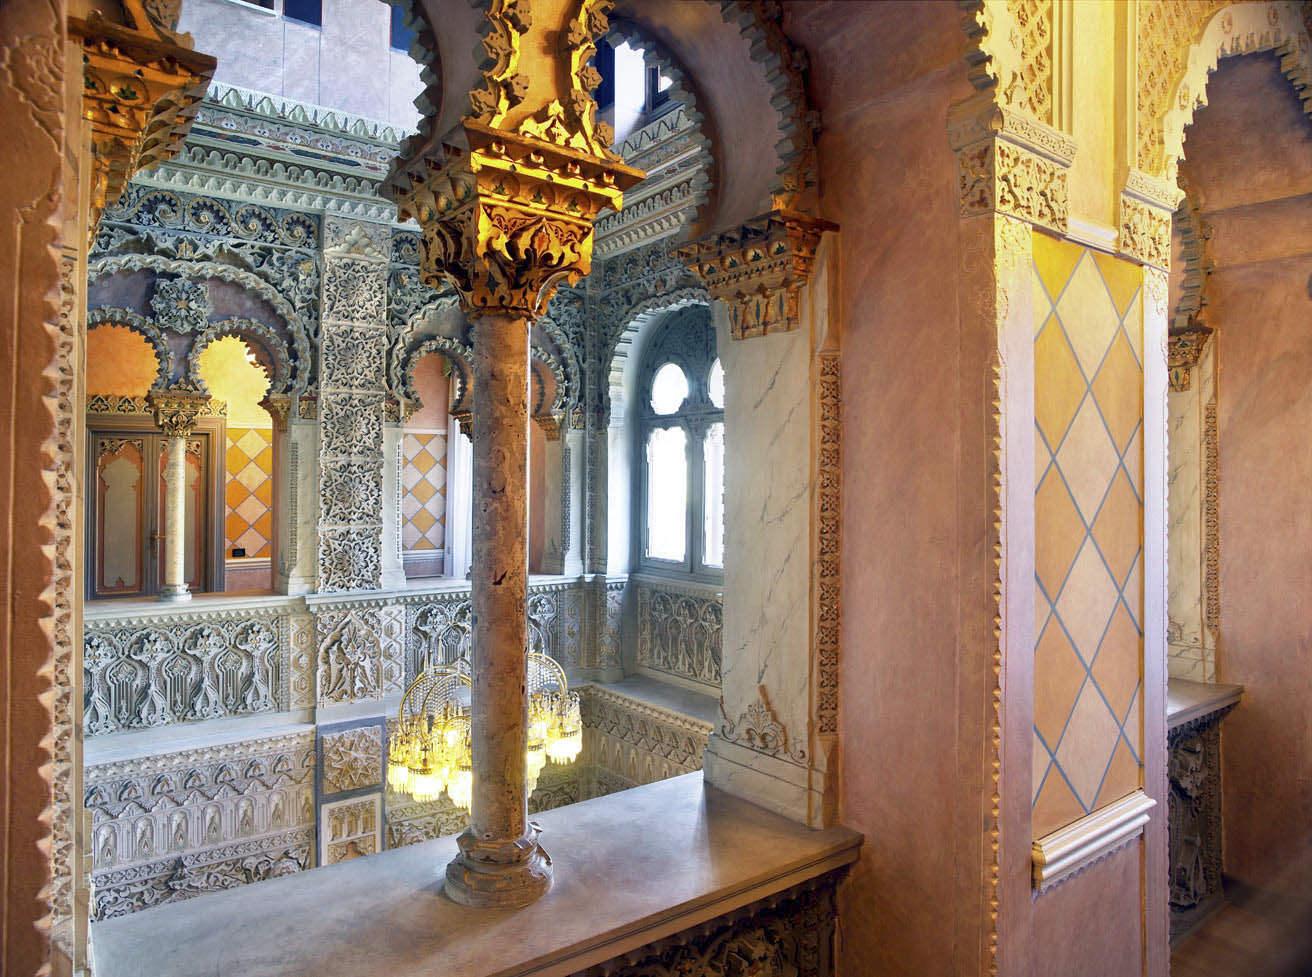 Interior of Villa Crespi